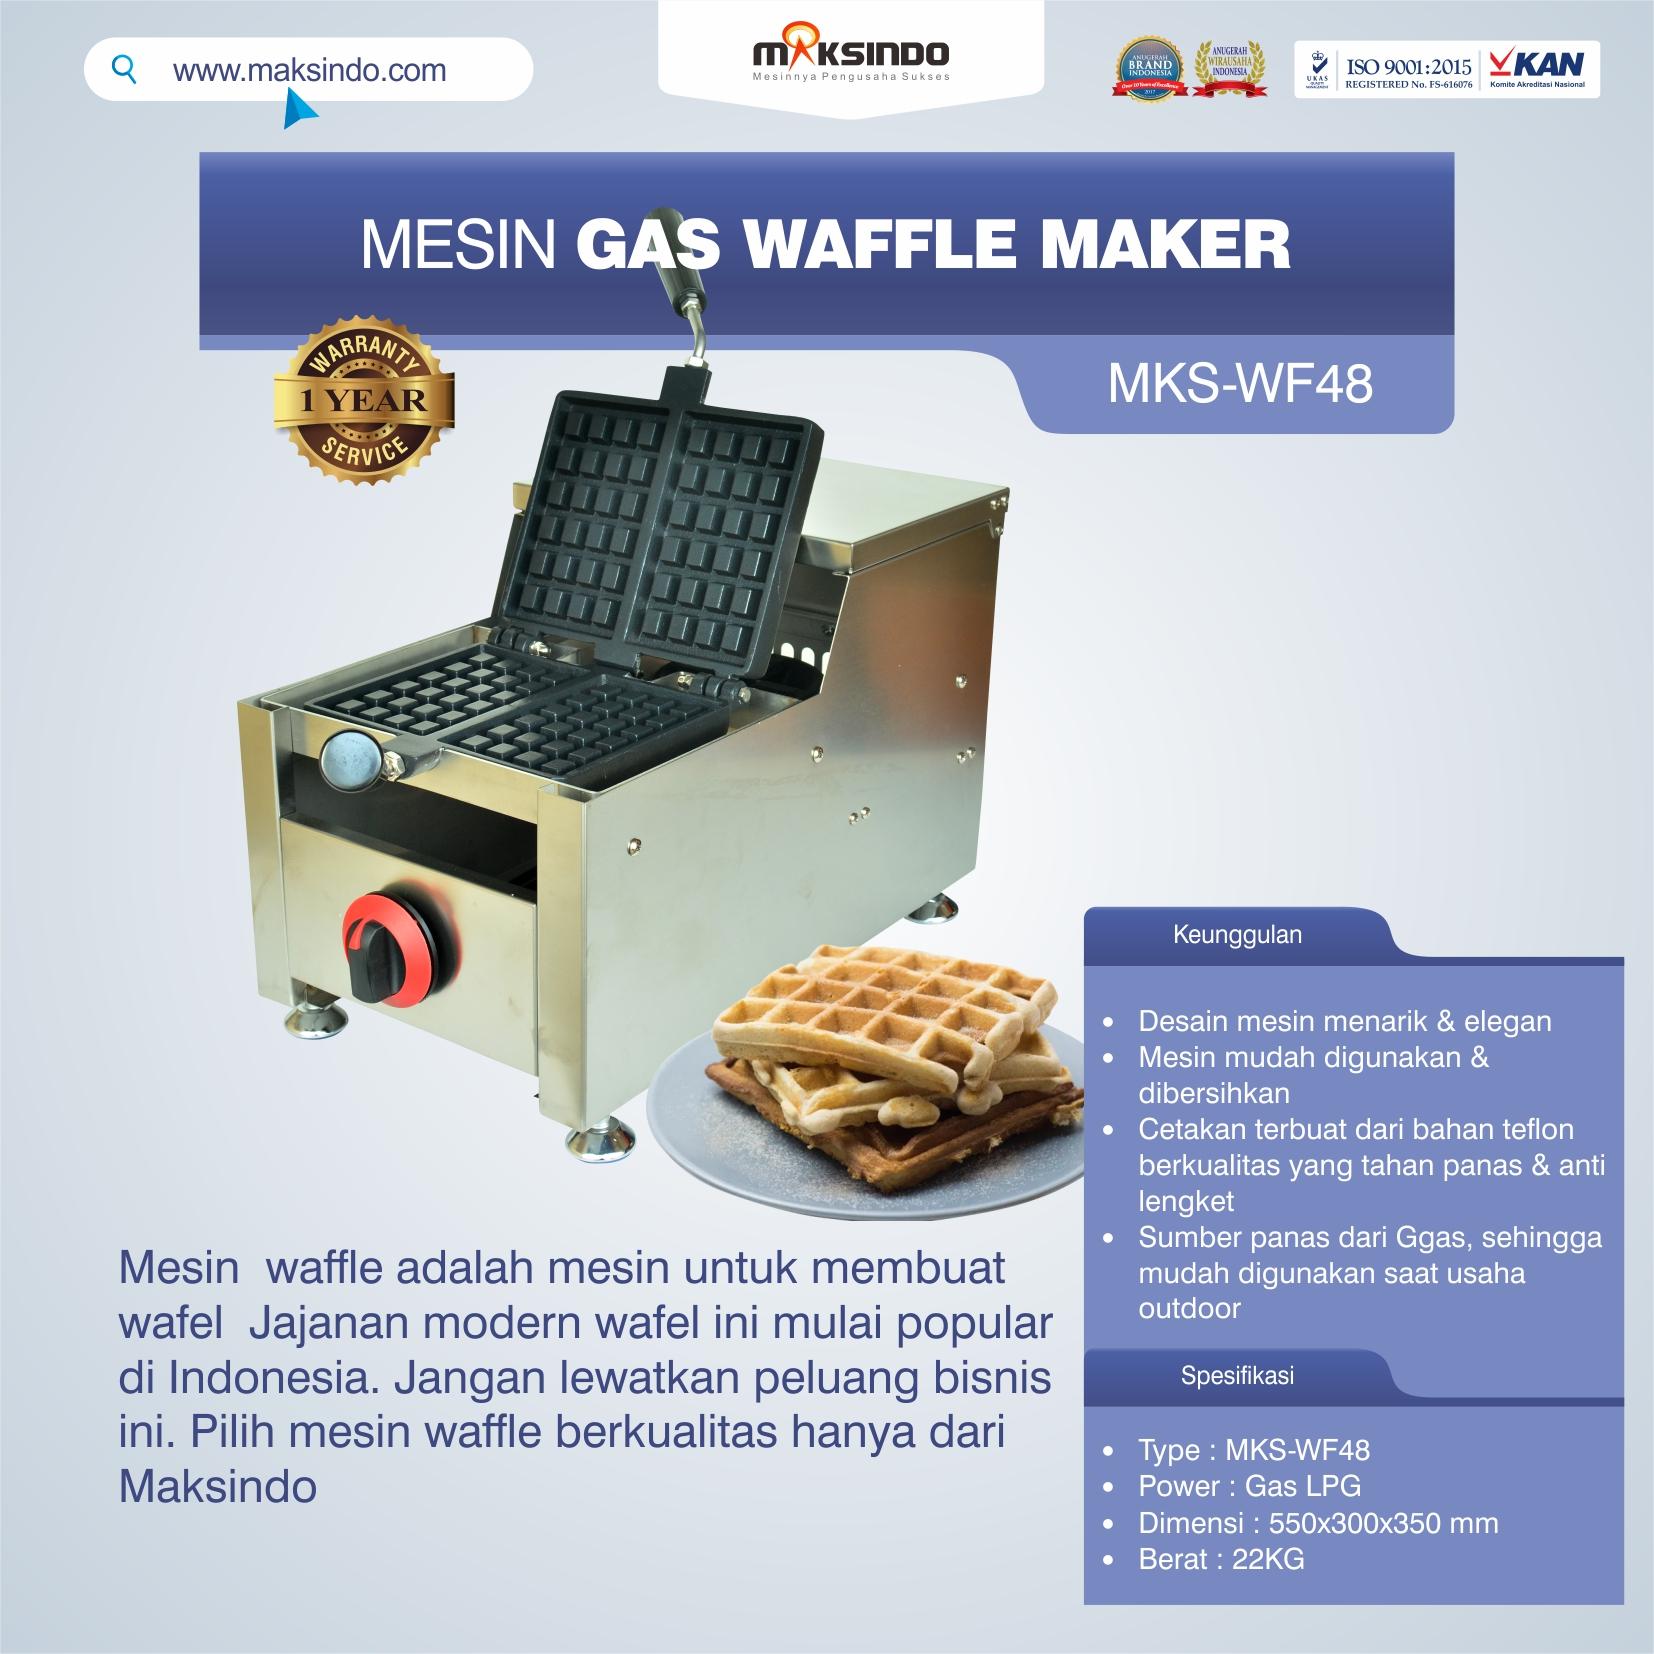 Mesin Gas Waffle Maker MKS-WF48